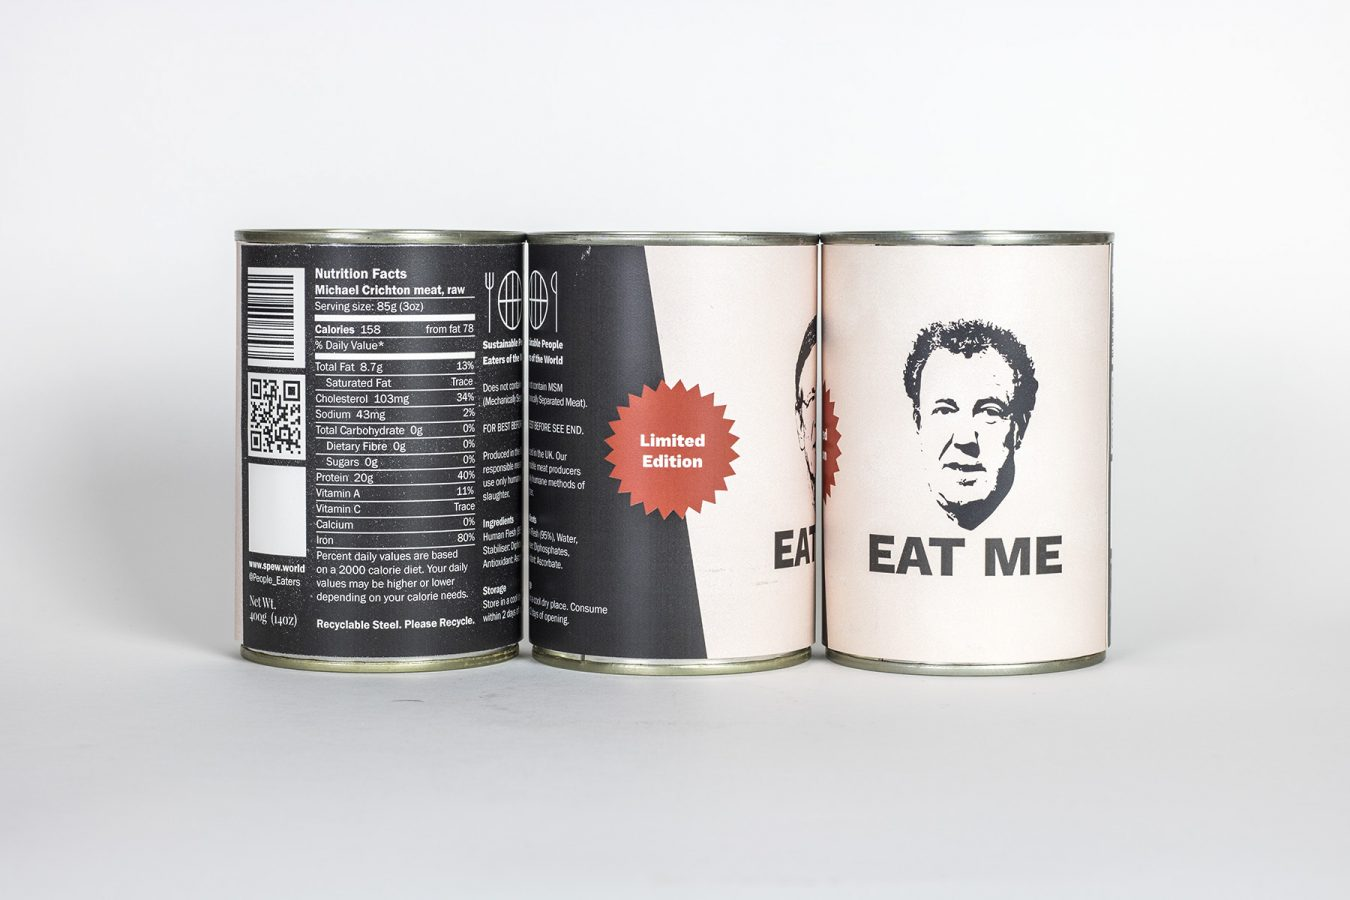 Eat Me – Jeremy Clarkson